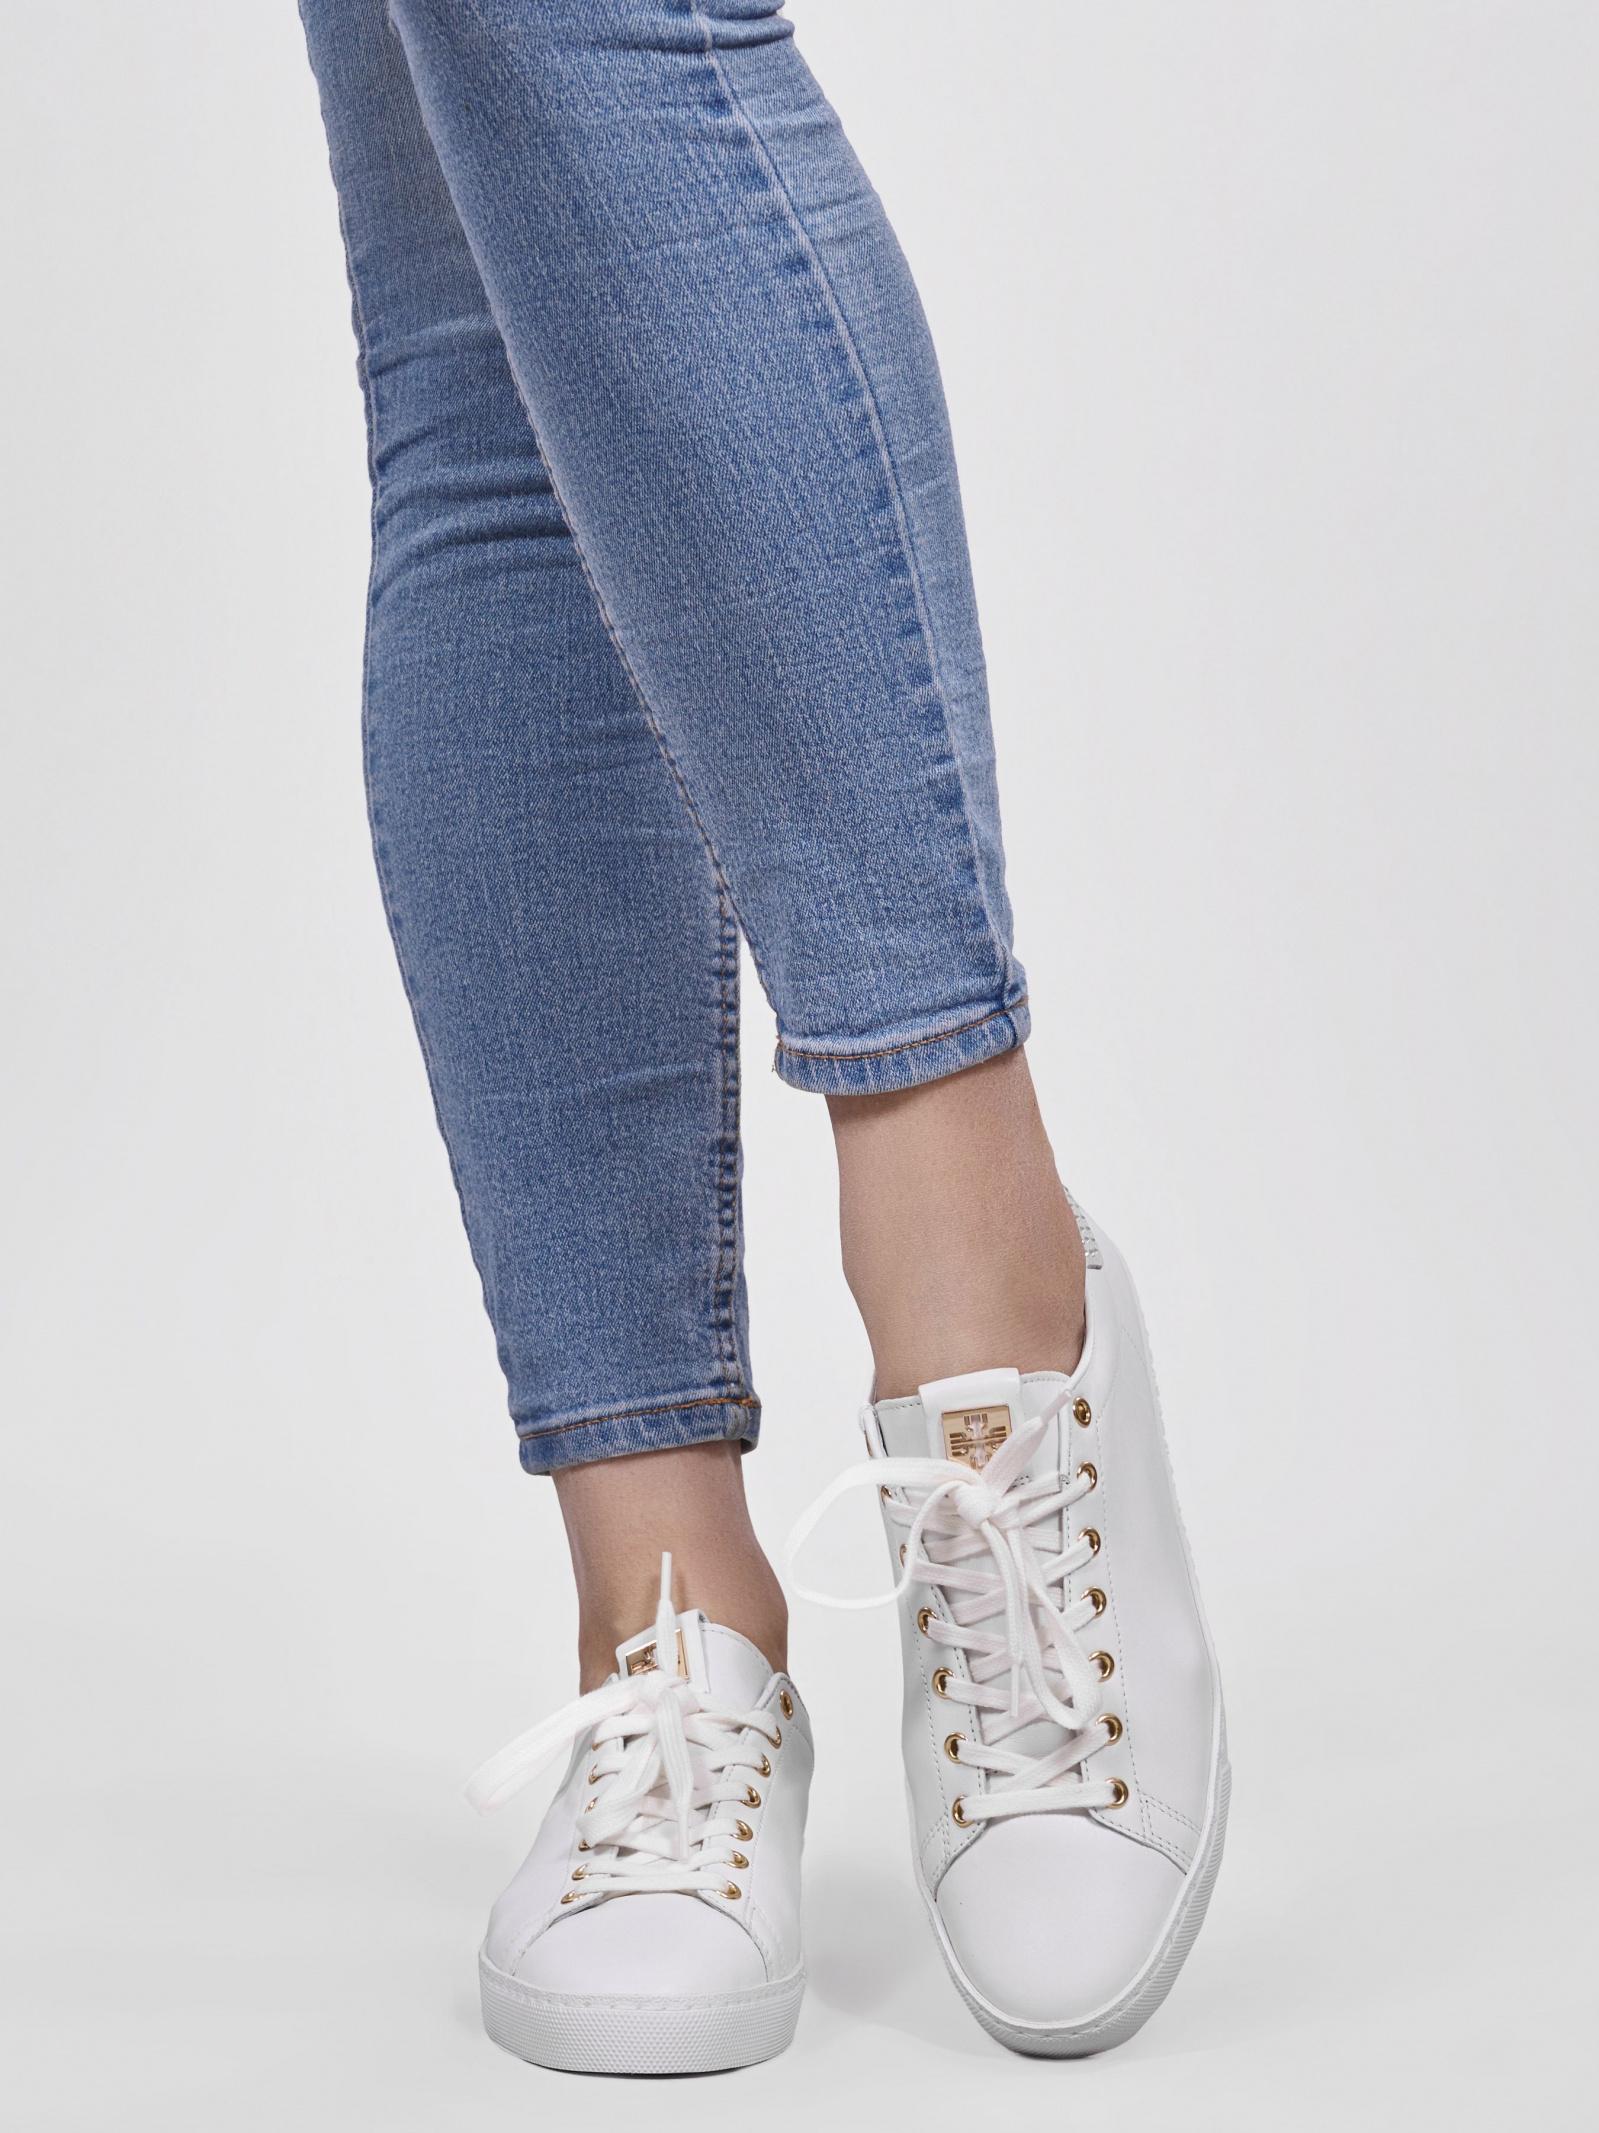 Кеды для женщин Hogl GLAMMY YN3983 модная обувь, 2017